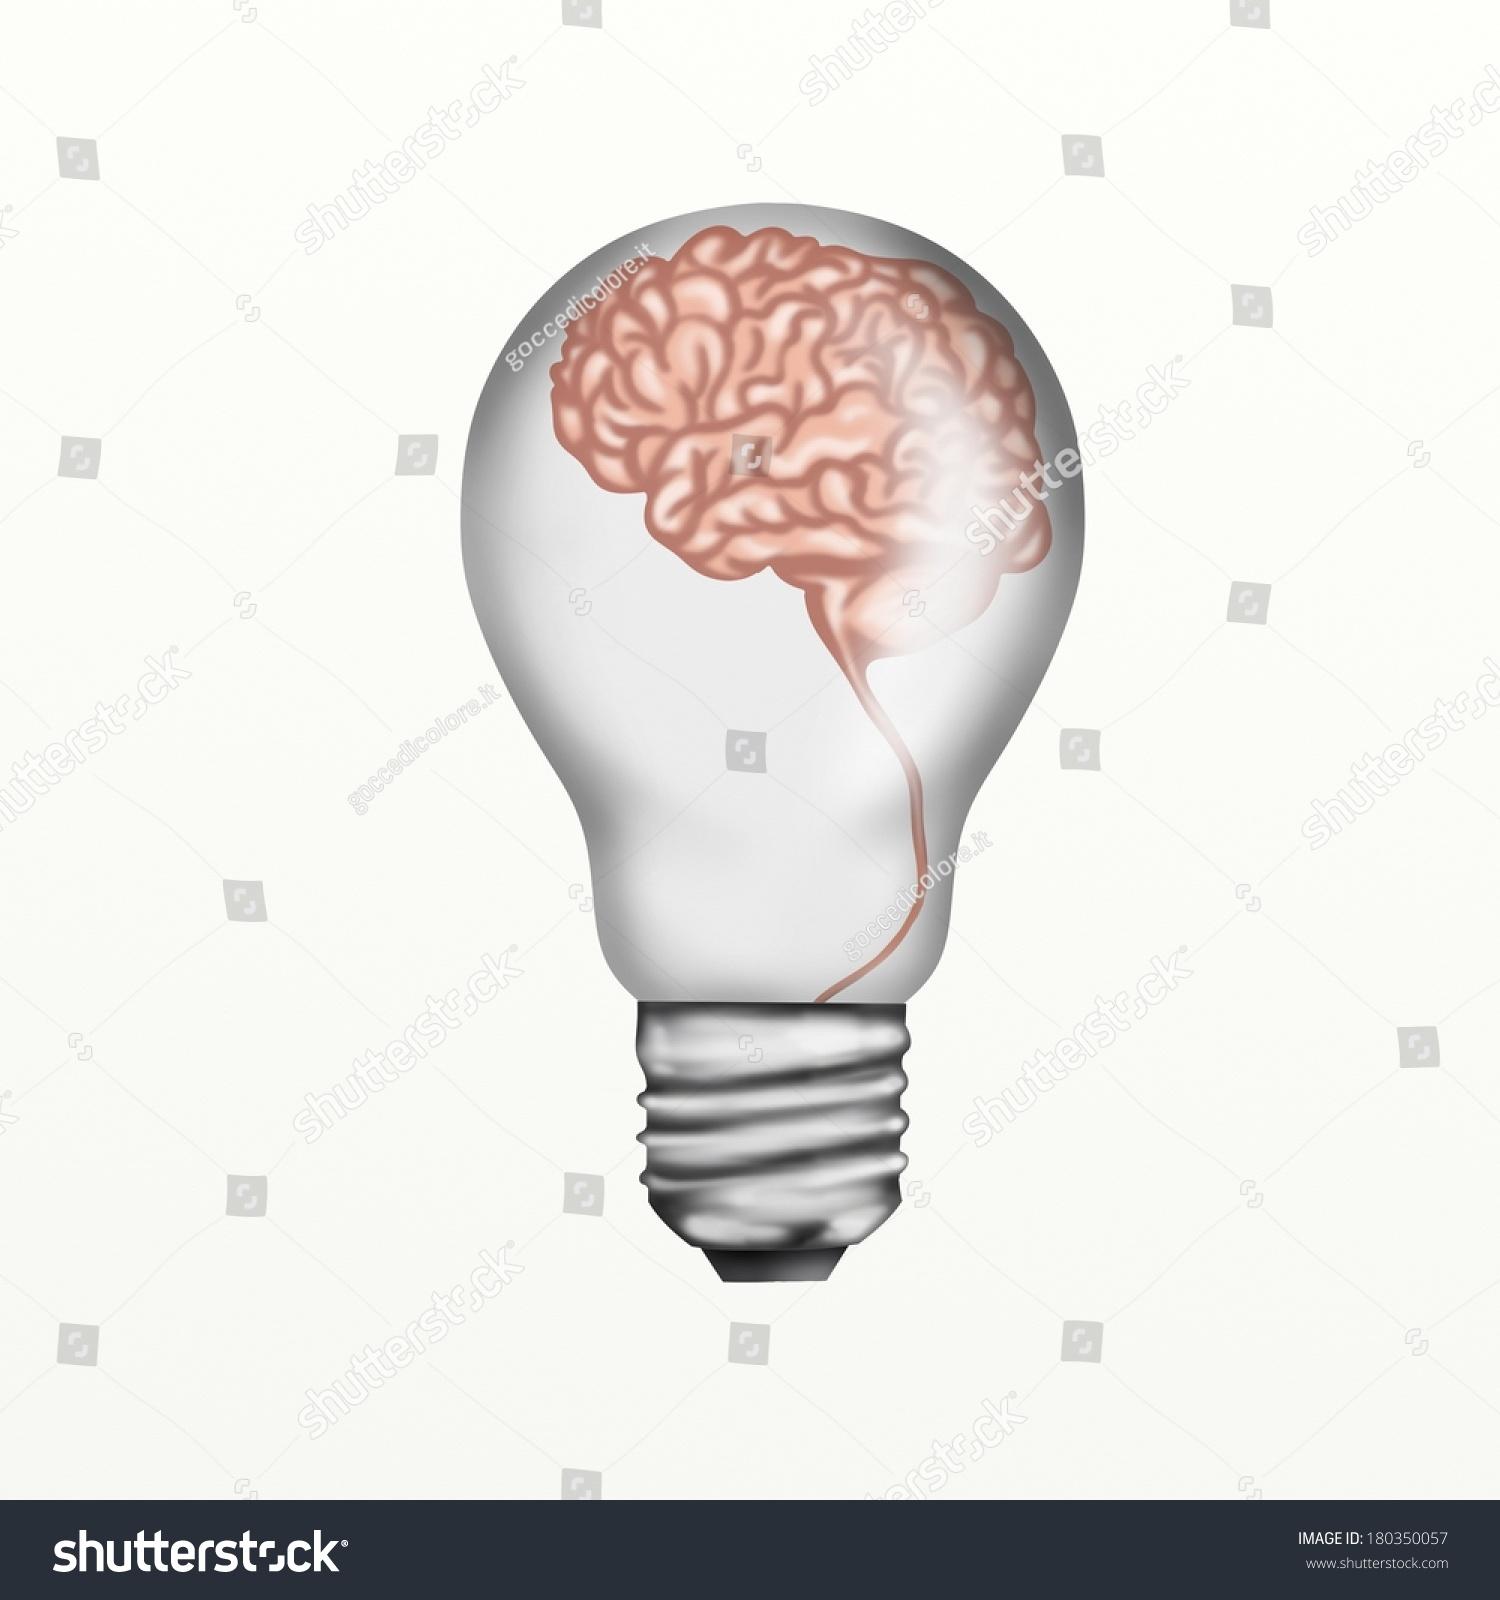 Drawing Light Bulb Brain Stock Illustration 180350057 - Shutterstock